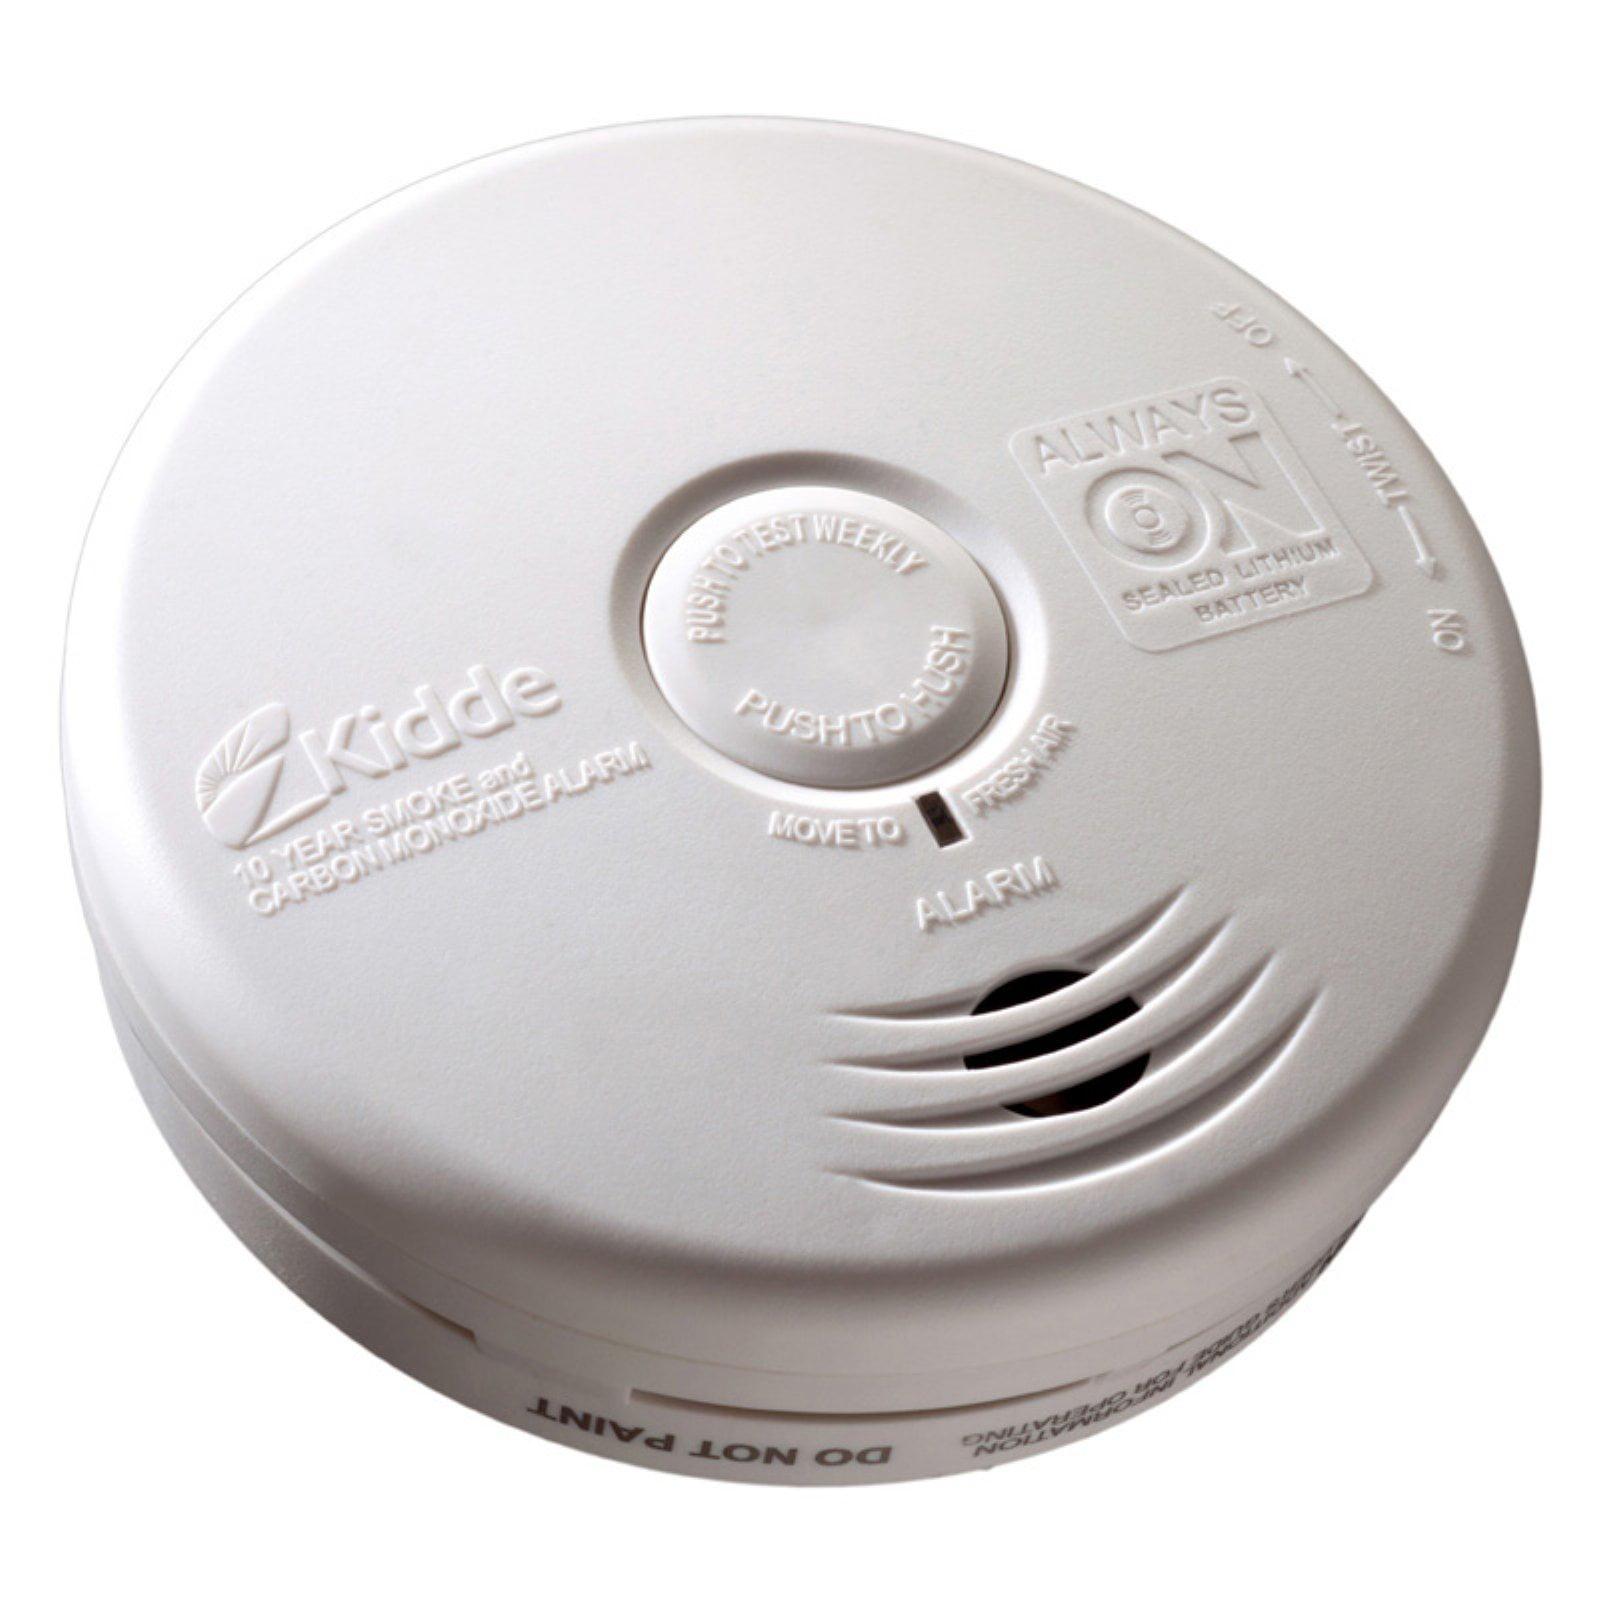 Kidde 21010170 10 Year Kitchen Smoke & Carbon Monoxide Detector by KIDDE